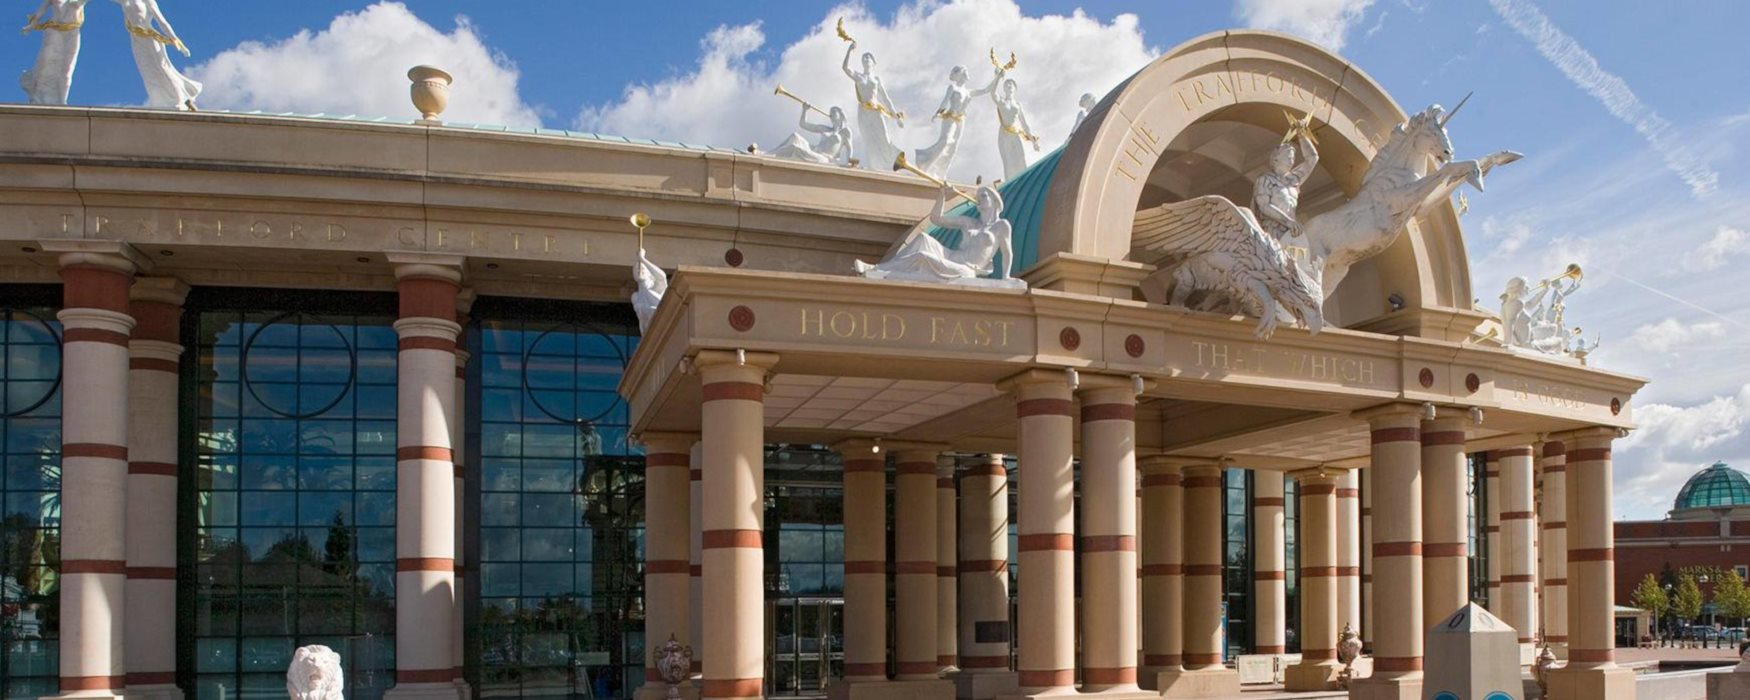 19afca1d9c0d Shopping in Manchester - Visit Manchester